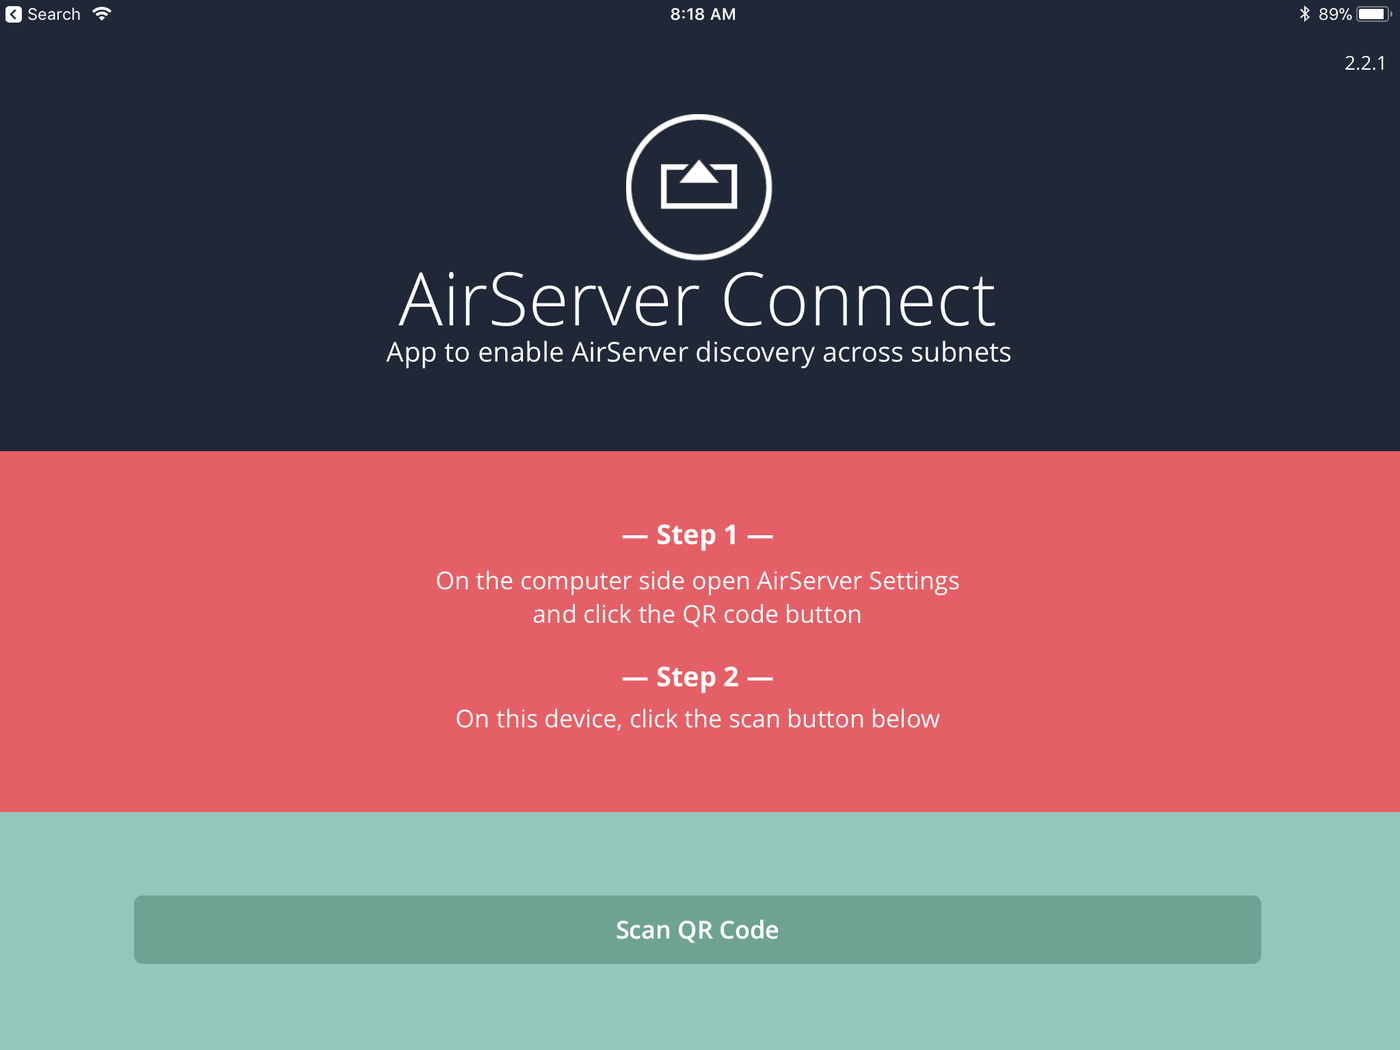 airserver scan qr code